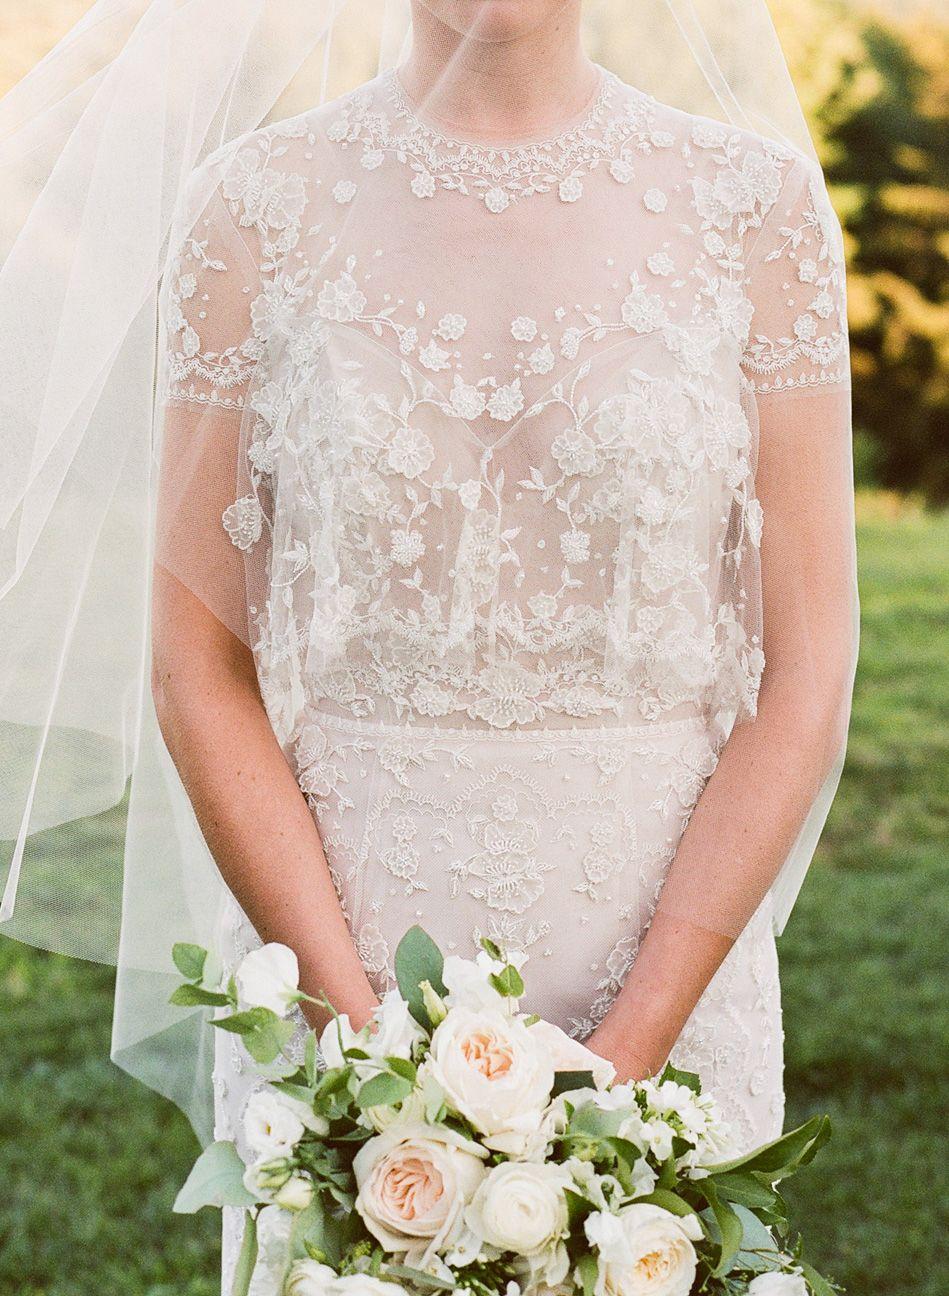 KarenHillPhotography-Parizat-Wedding-0483.jpg